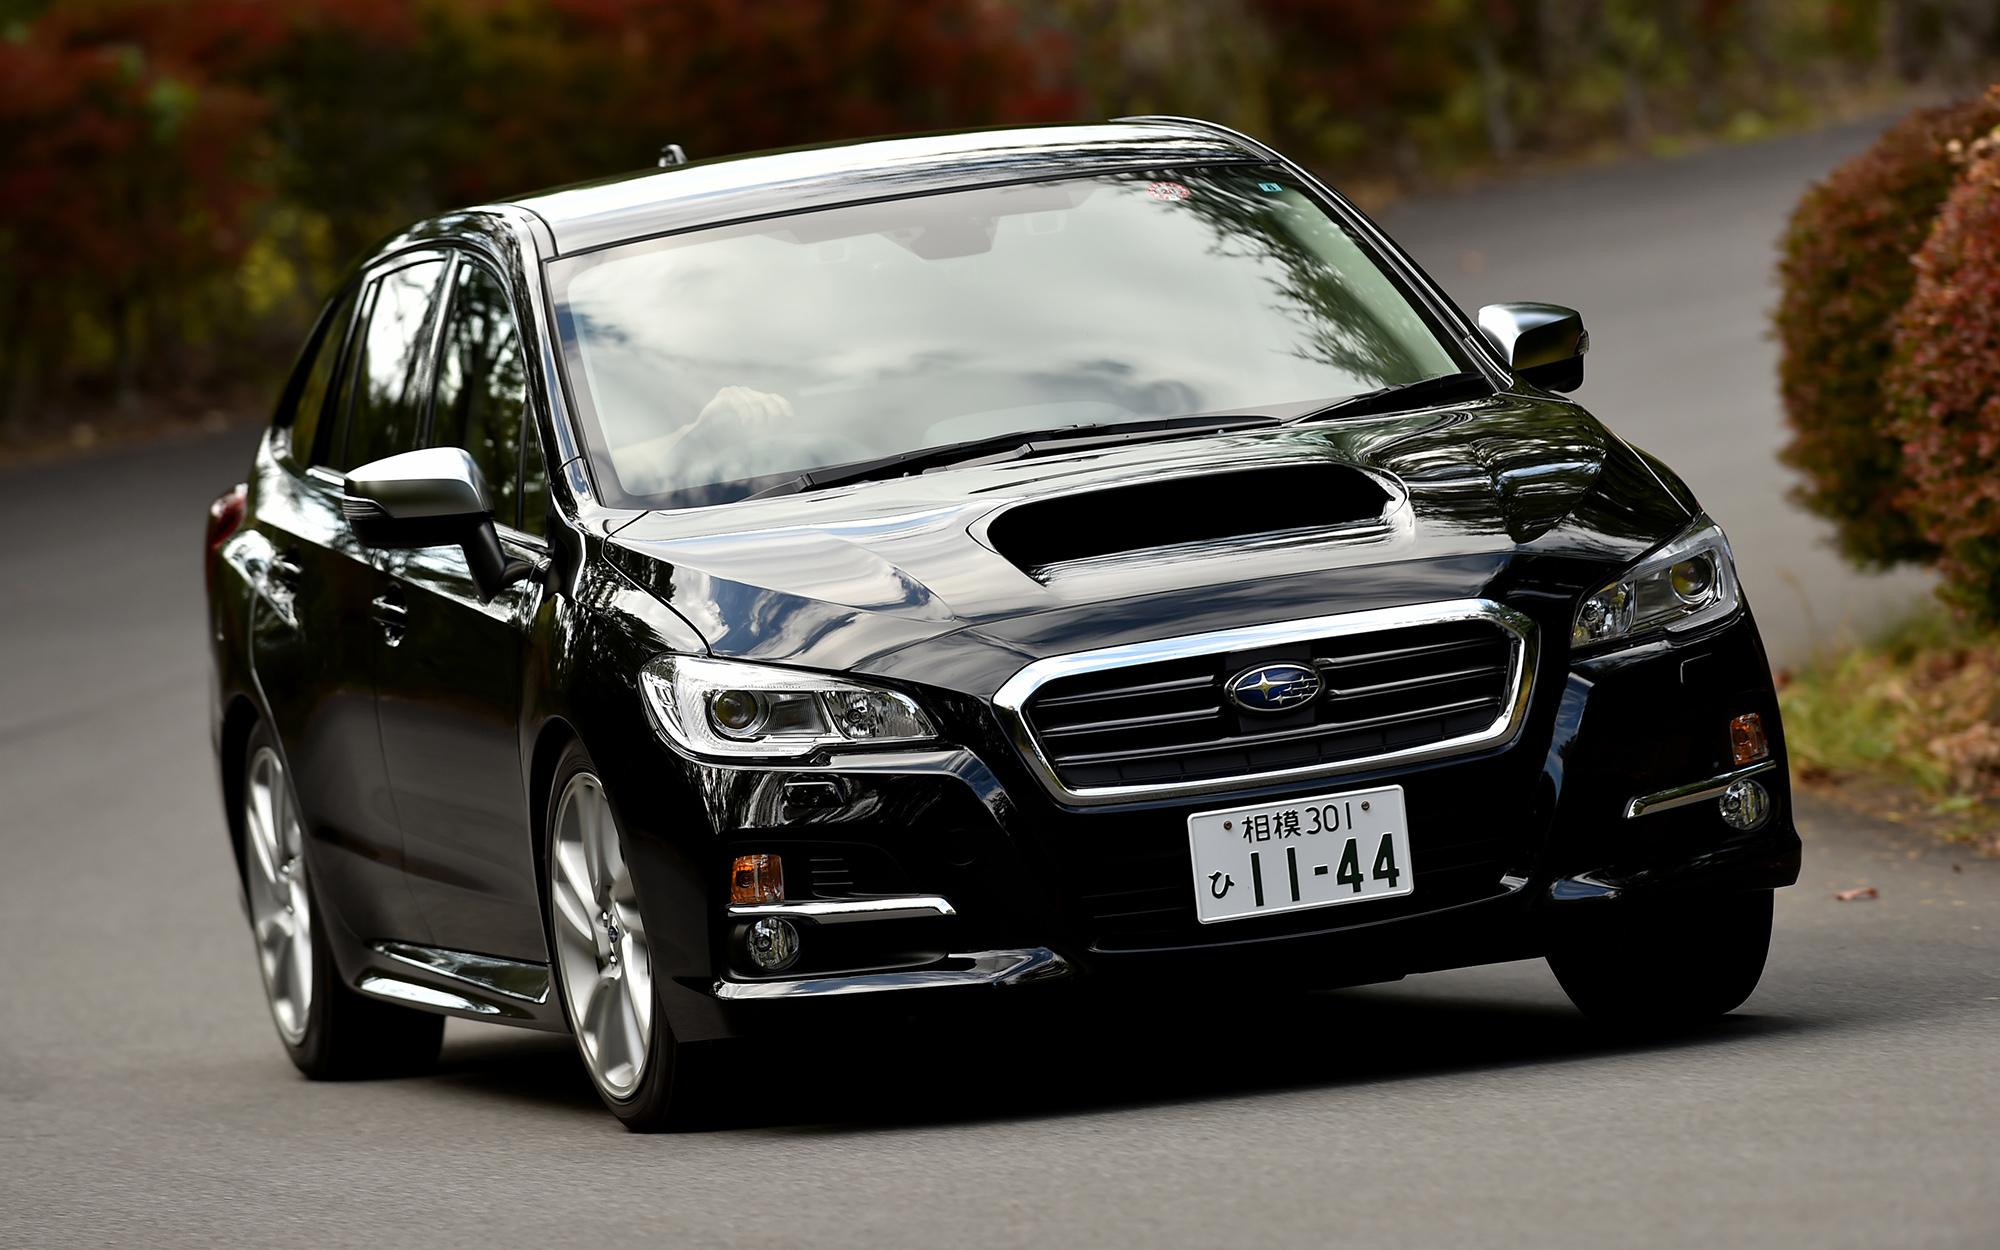 2016 Subaru Levorg: Initial details revealed - NASIOC